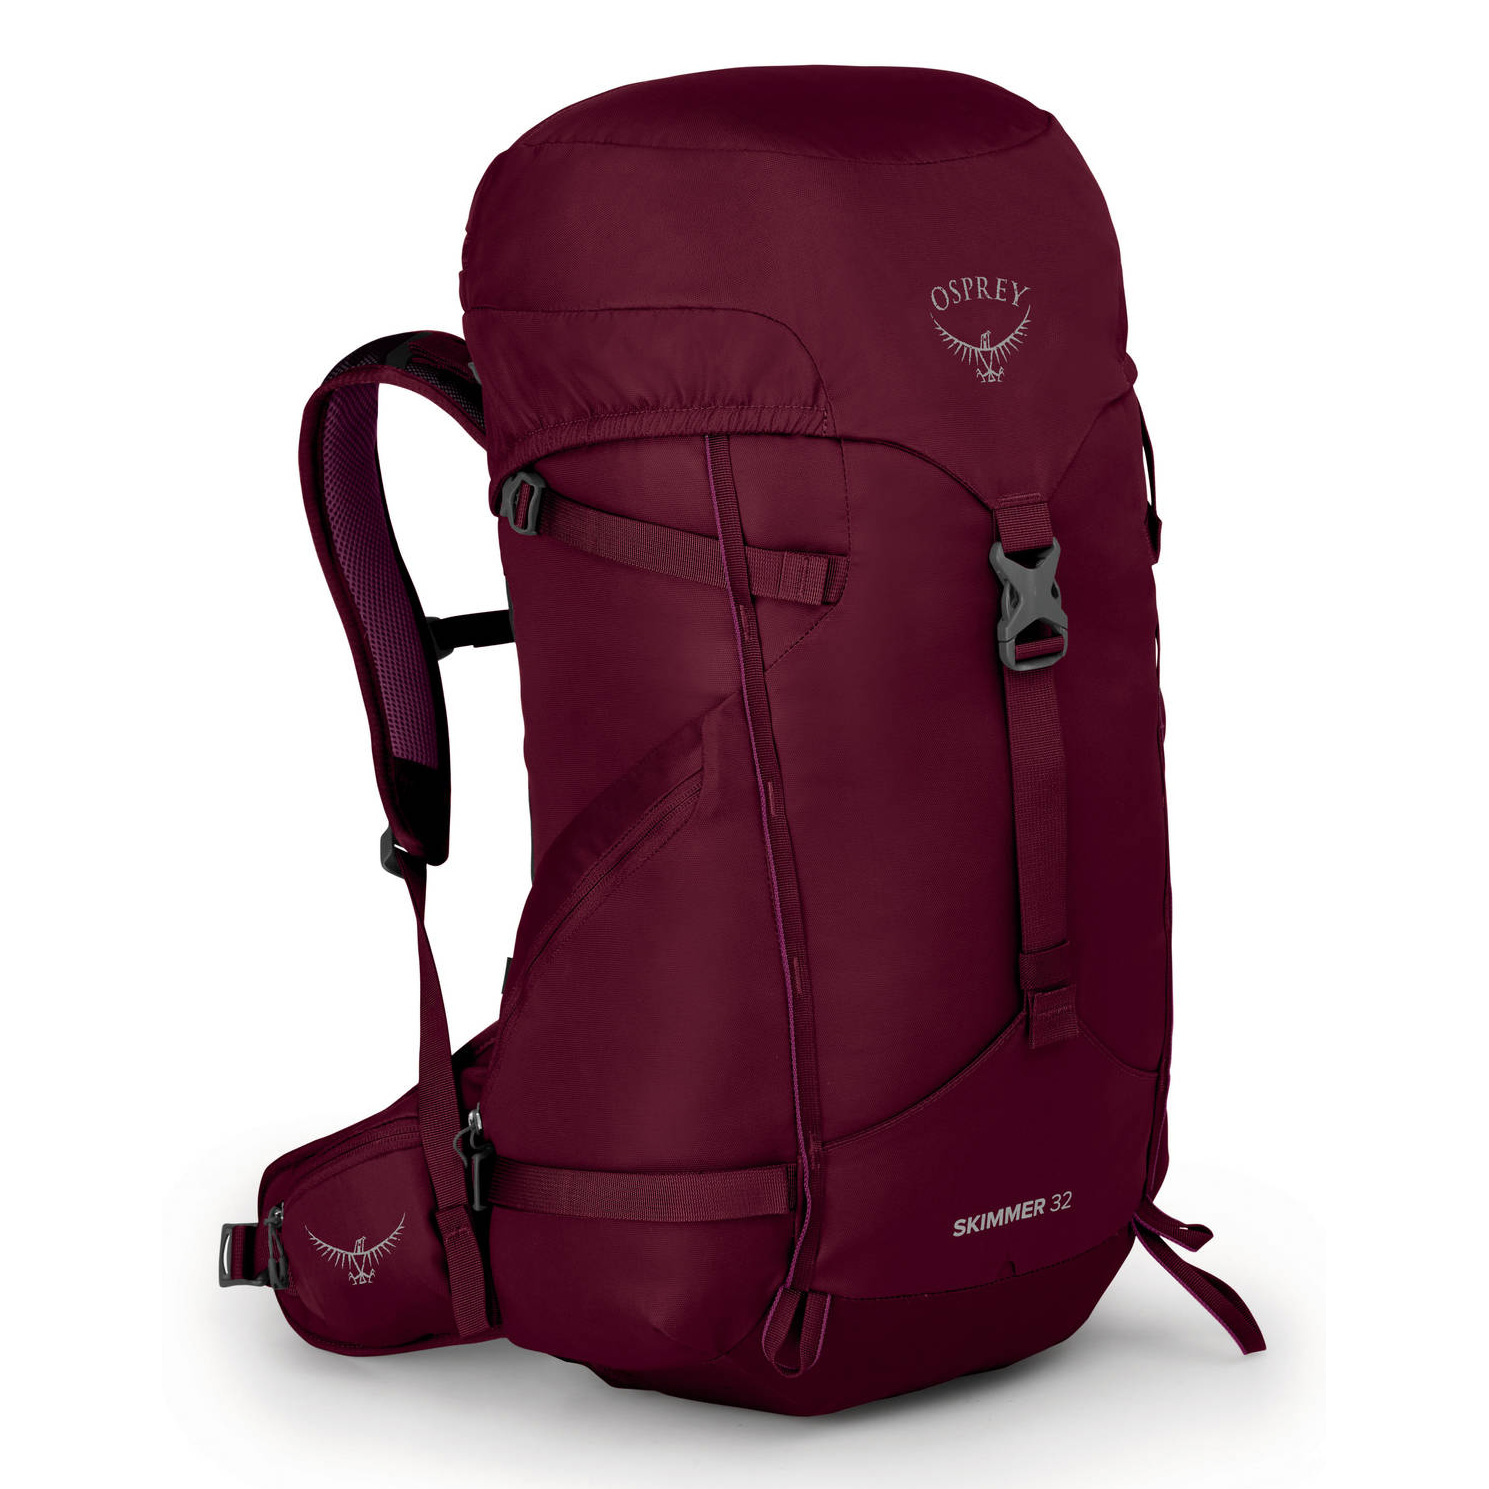 Osprey Skimmer 32 - Backpack - Plum Red